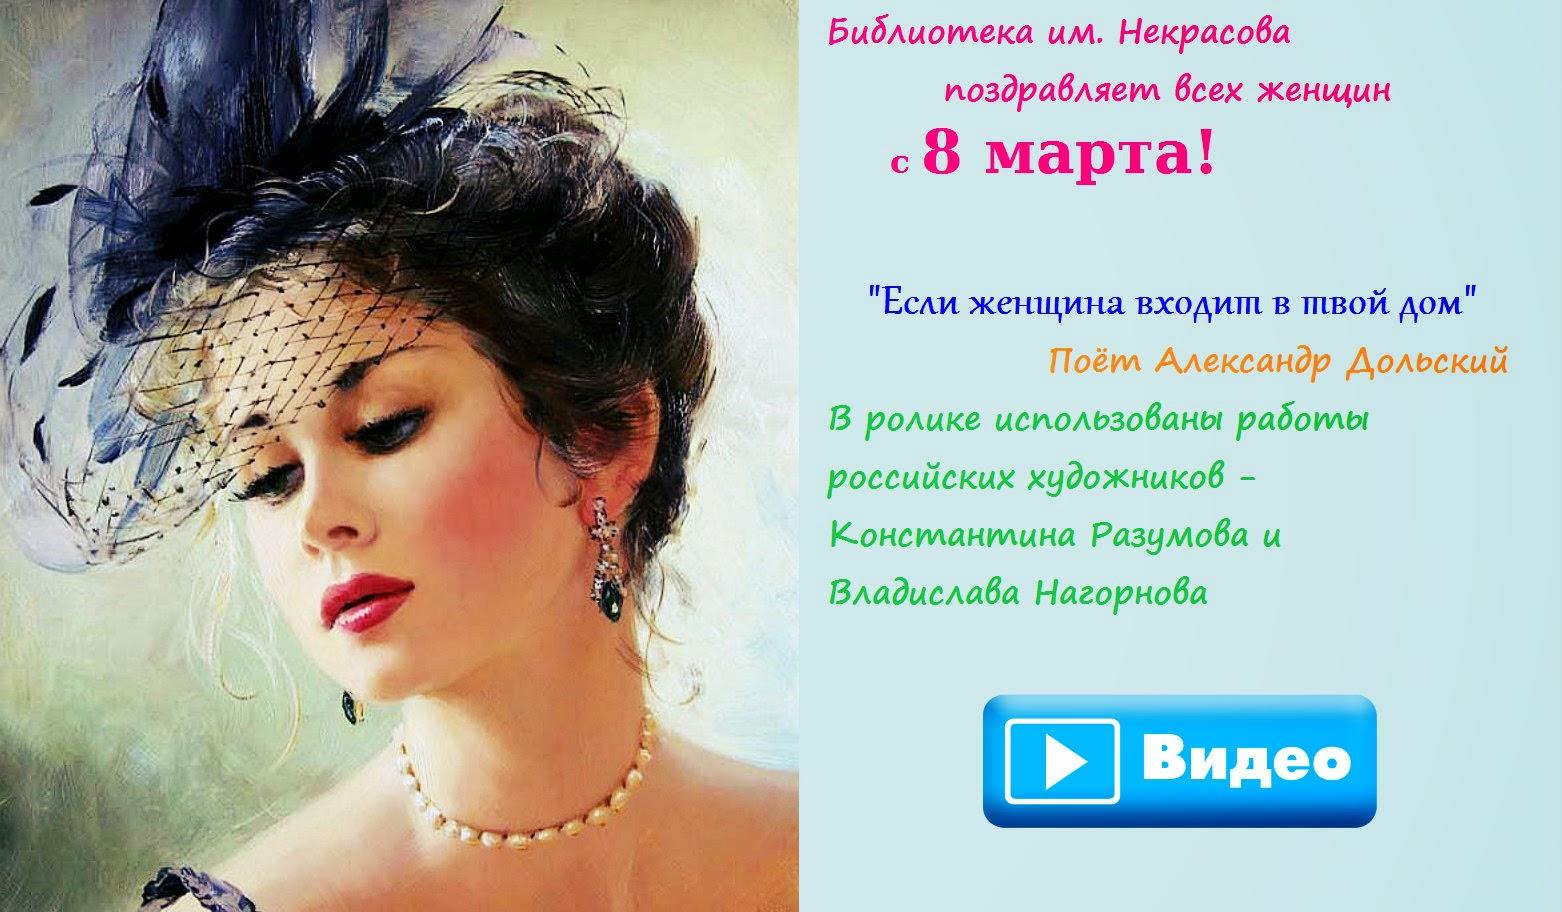 http://youtu.be/--qOlhN7u_U